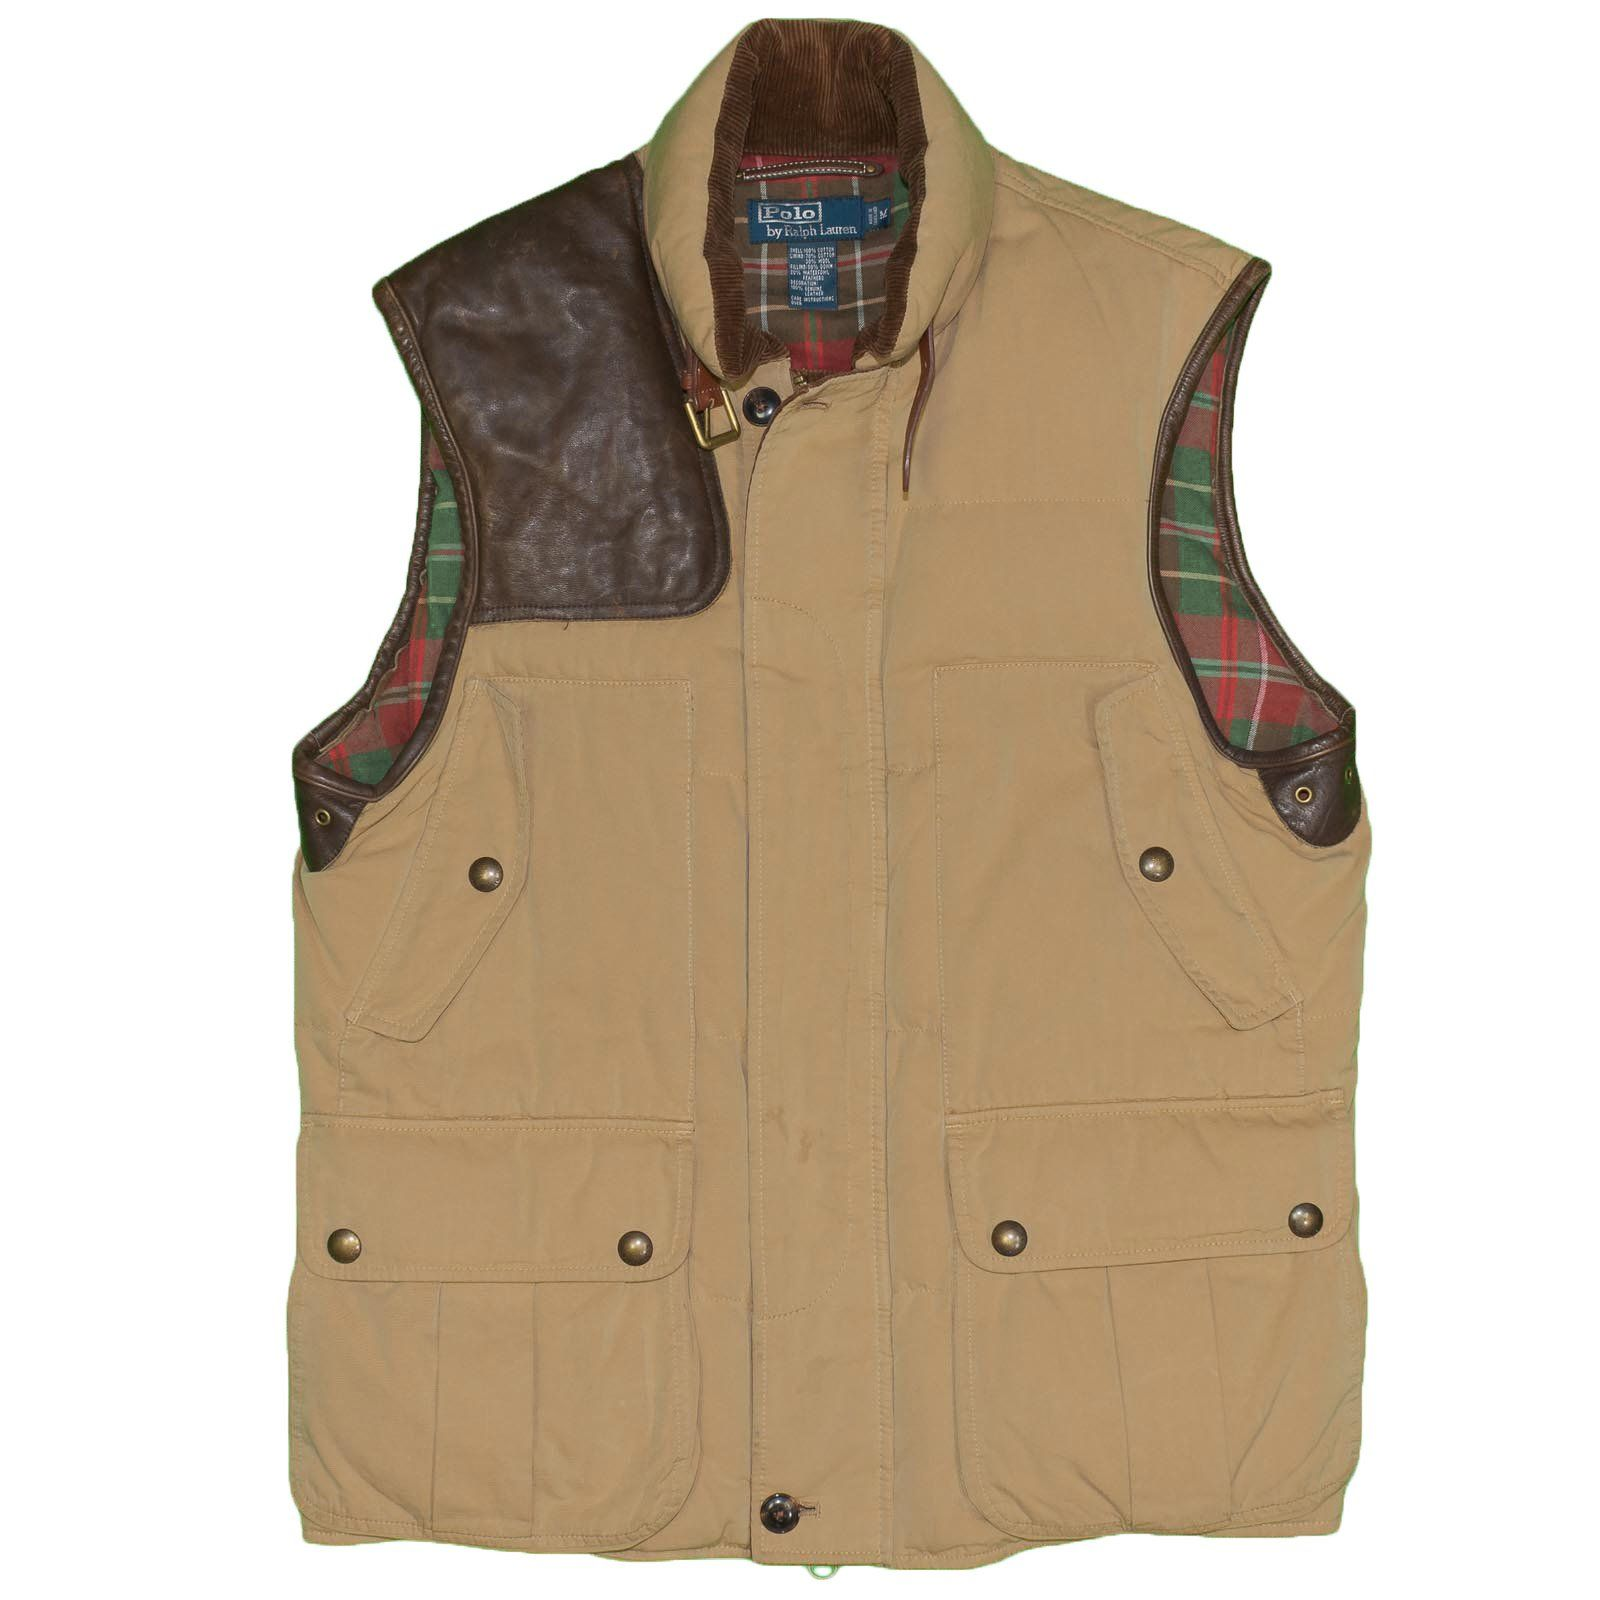 Polo Ralph Lauren Men's Vest Jacket Medium Leather Down